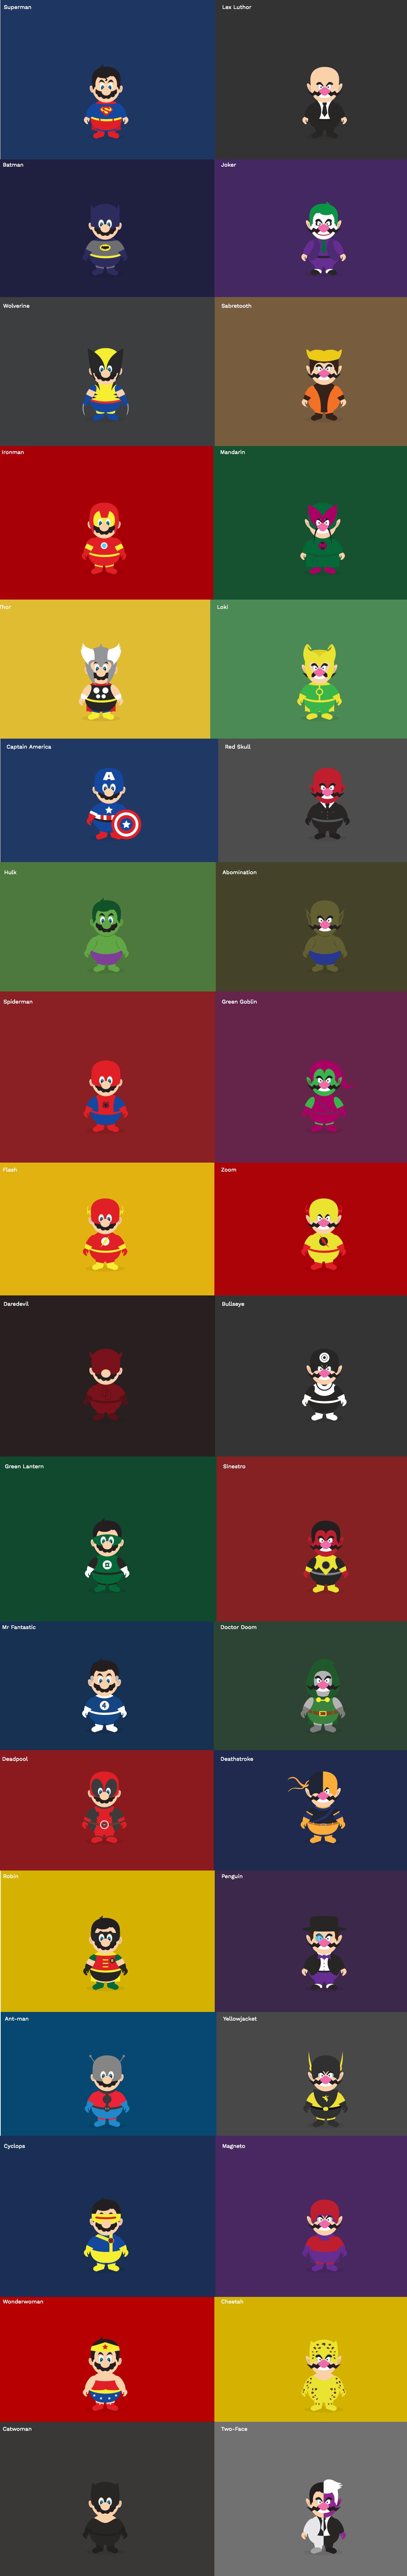 When Super Mario & Super Wario Becomes SuperHeros